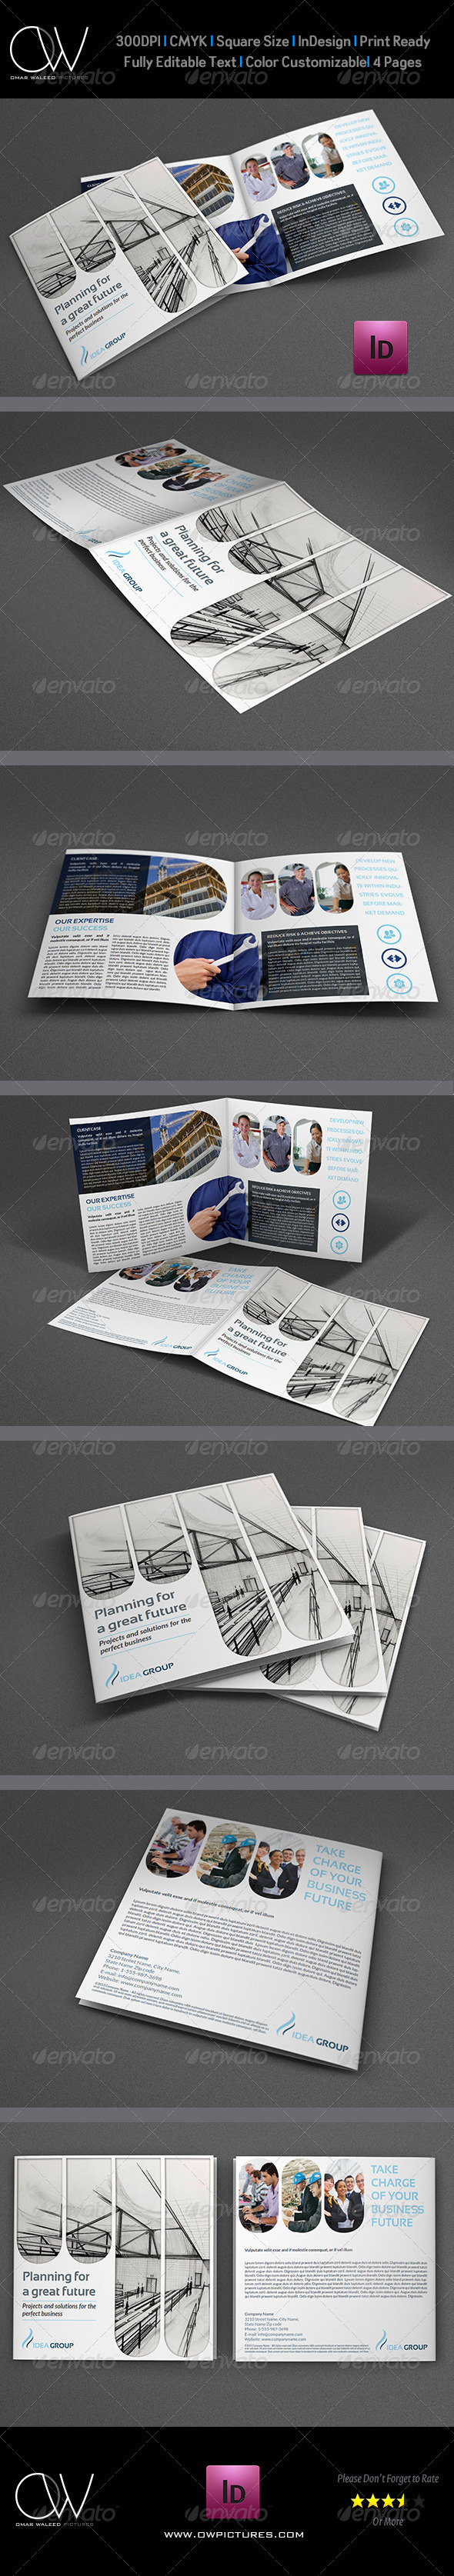 Company Brochure Bi-Fold Template Vol.15 - Corporate Brochures